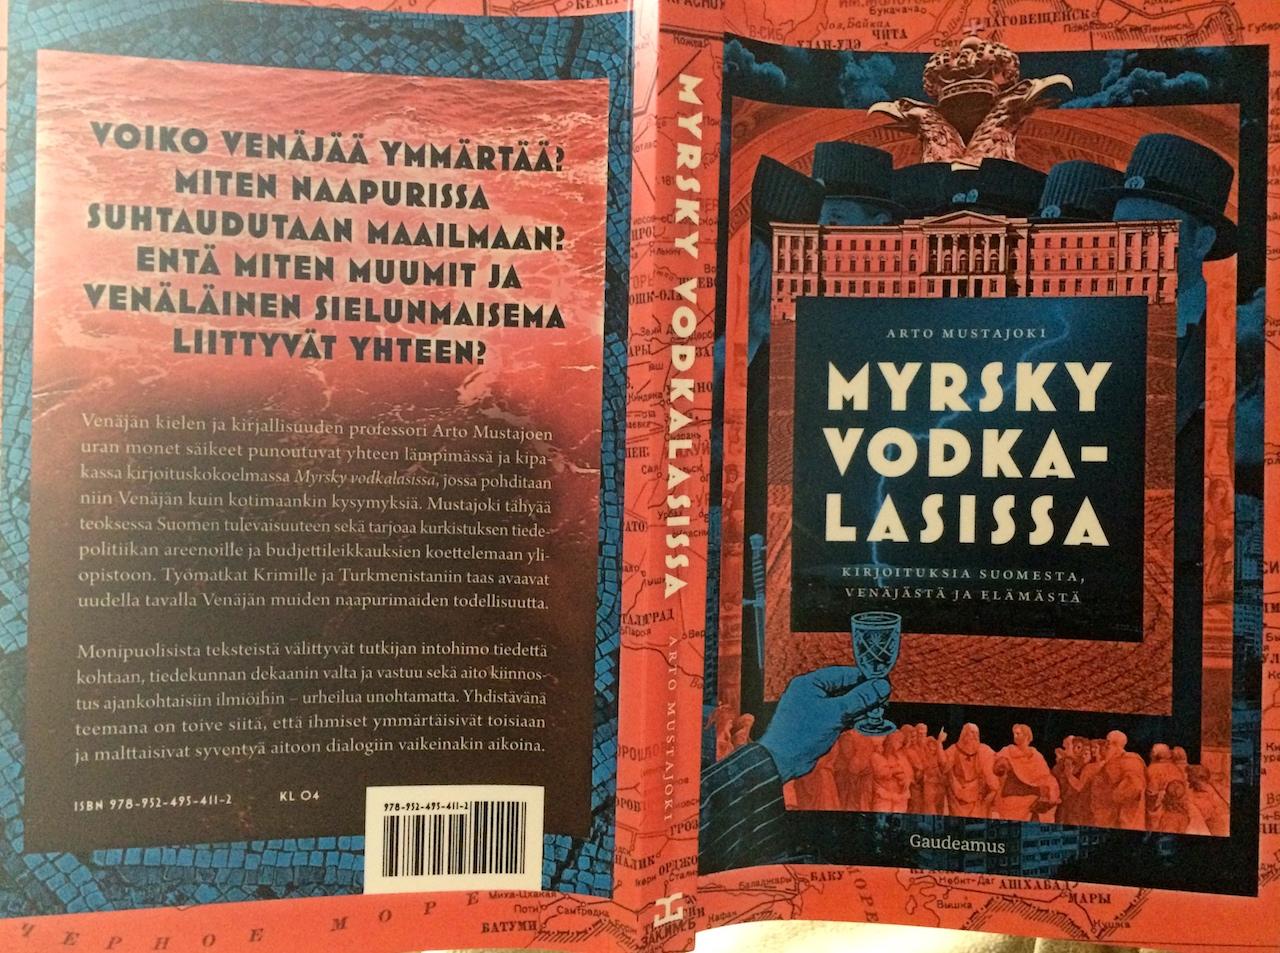 Kirja-arvio: Arto Mustajoki – Myrsky vodkalasissa